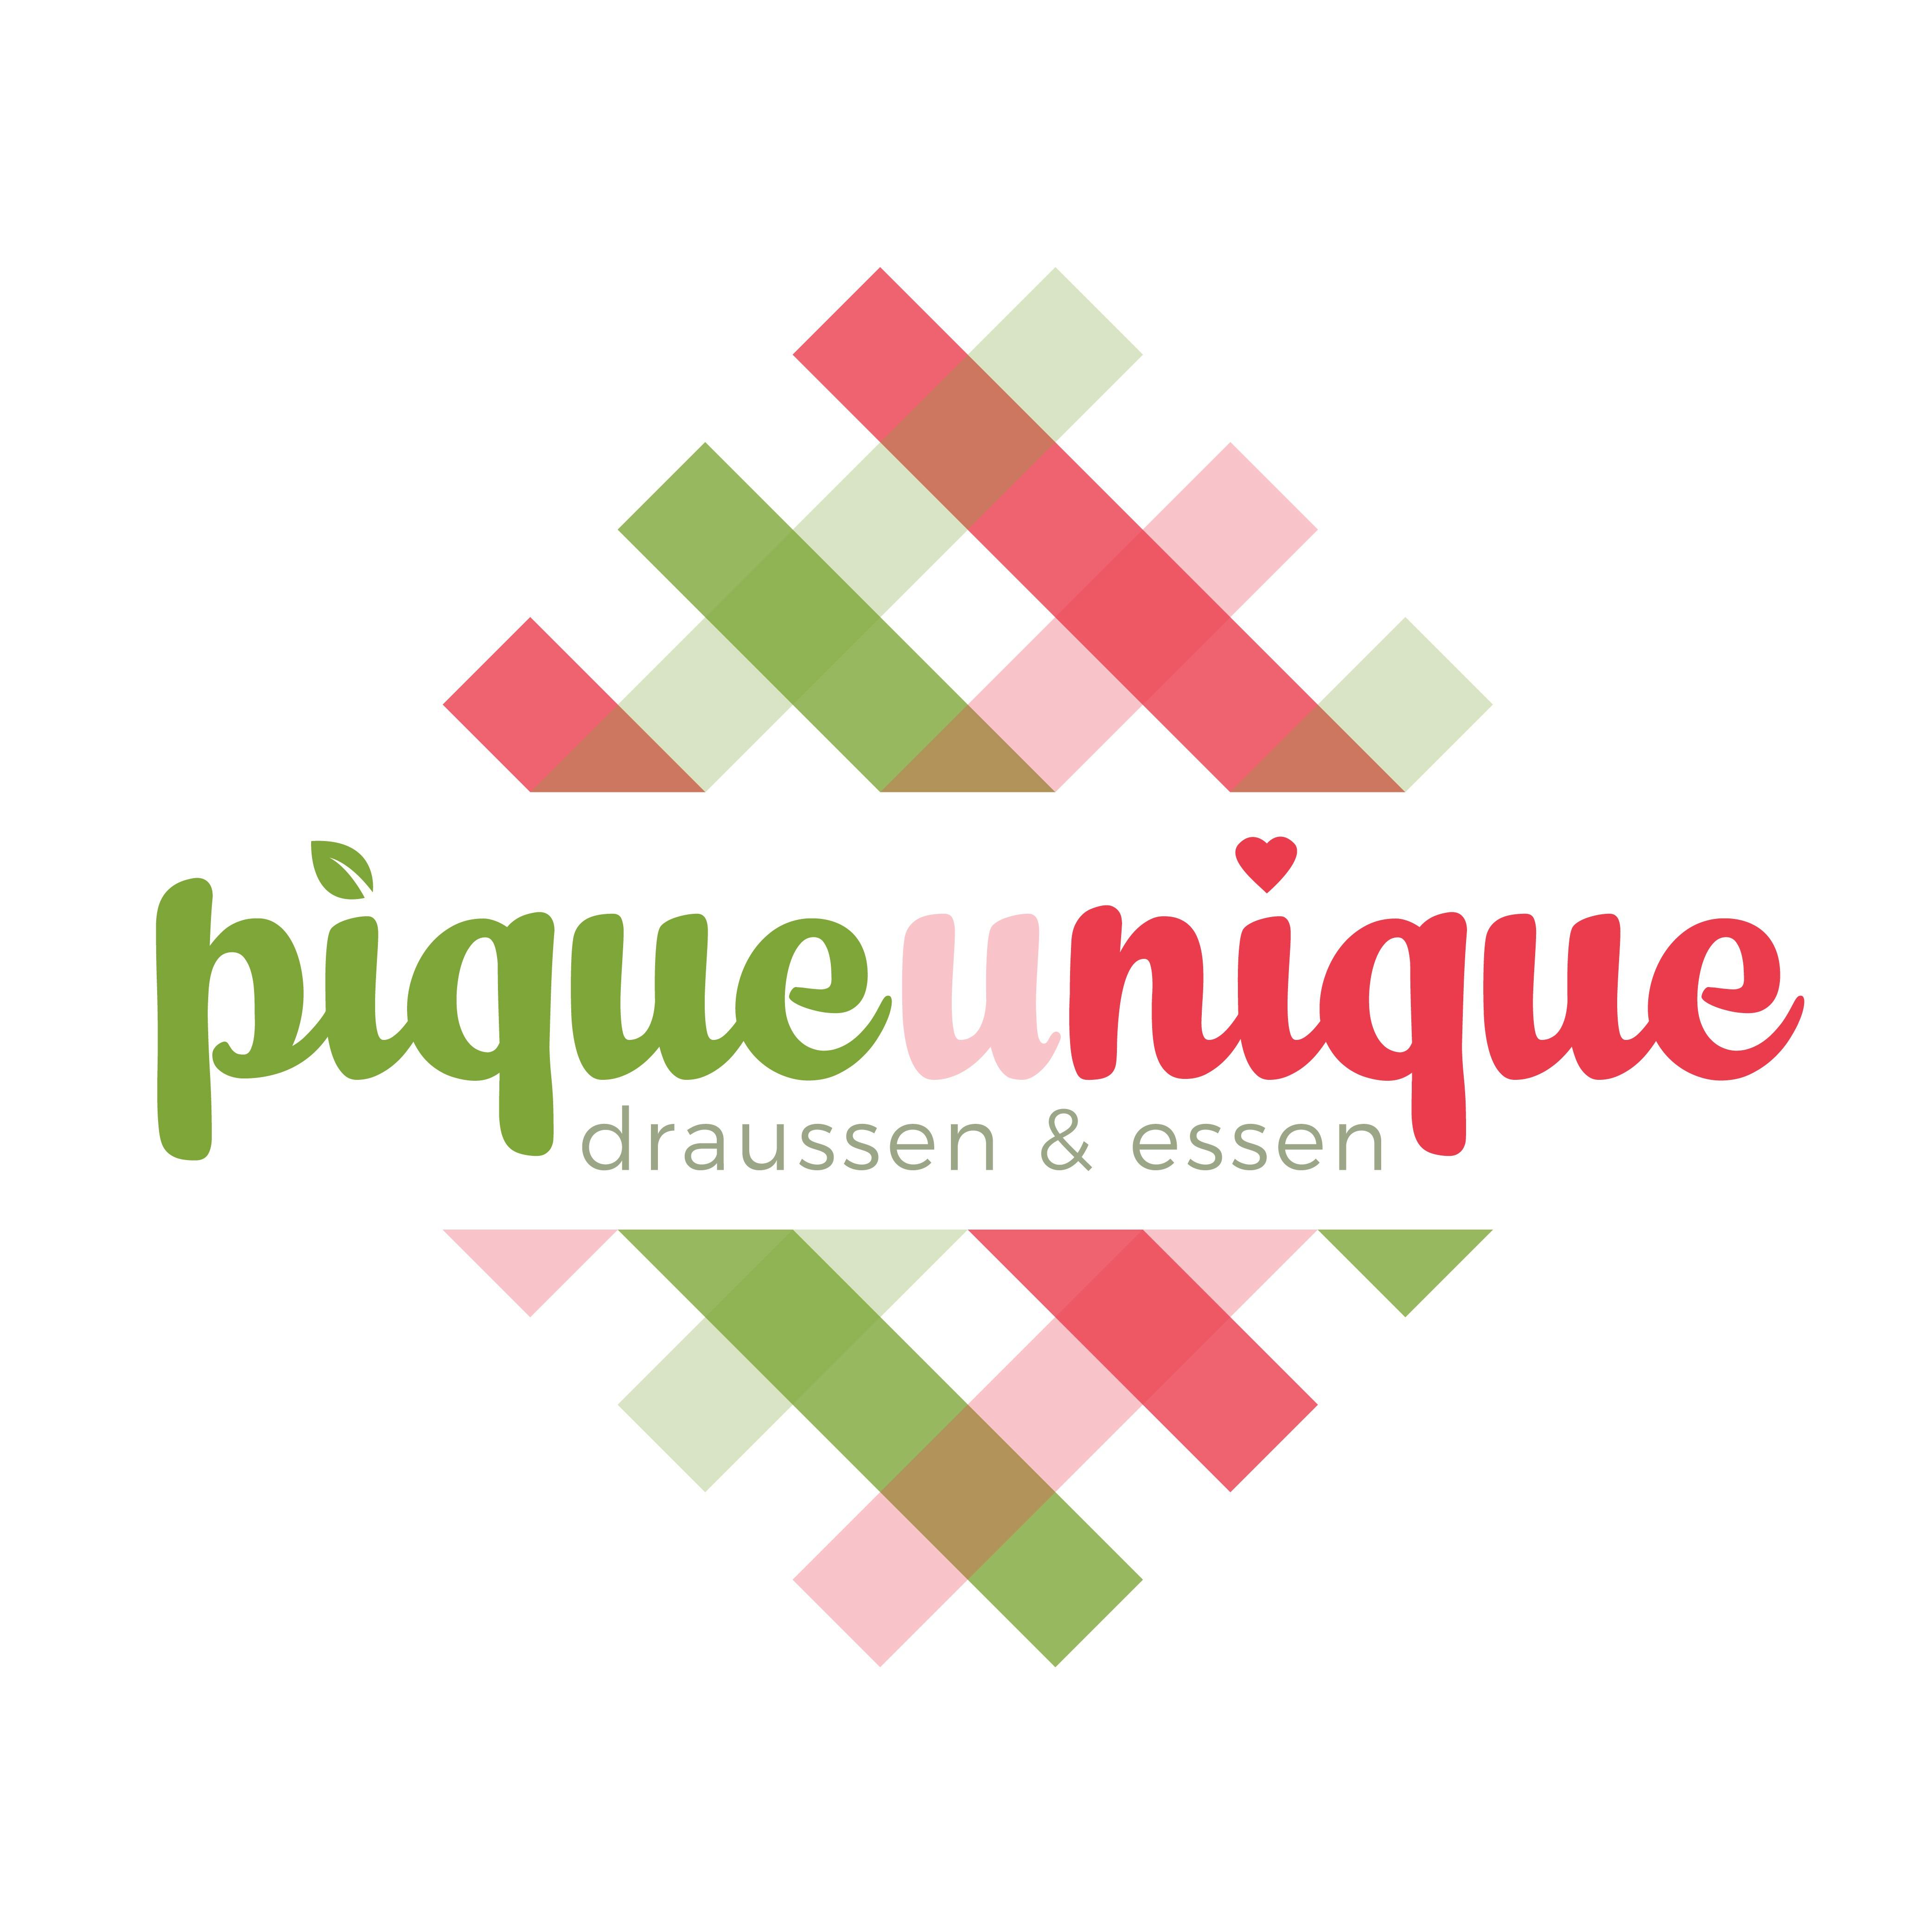 picnic as an attitude towards life - how might a logo express this?